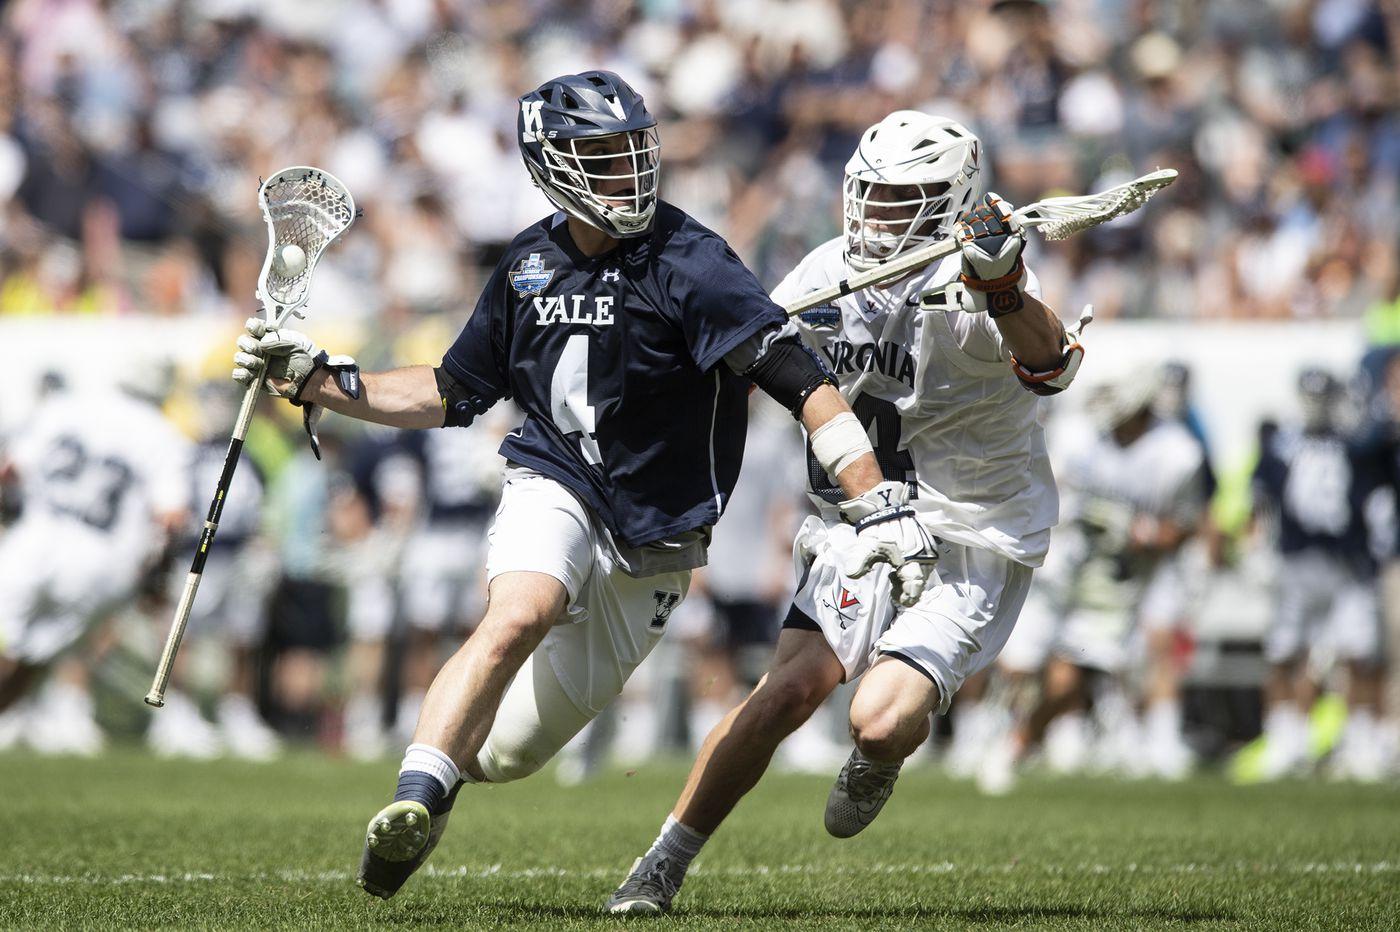 NCAA lacrosse championship: Virginia's defense key to national championship victory